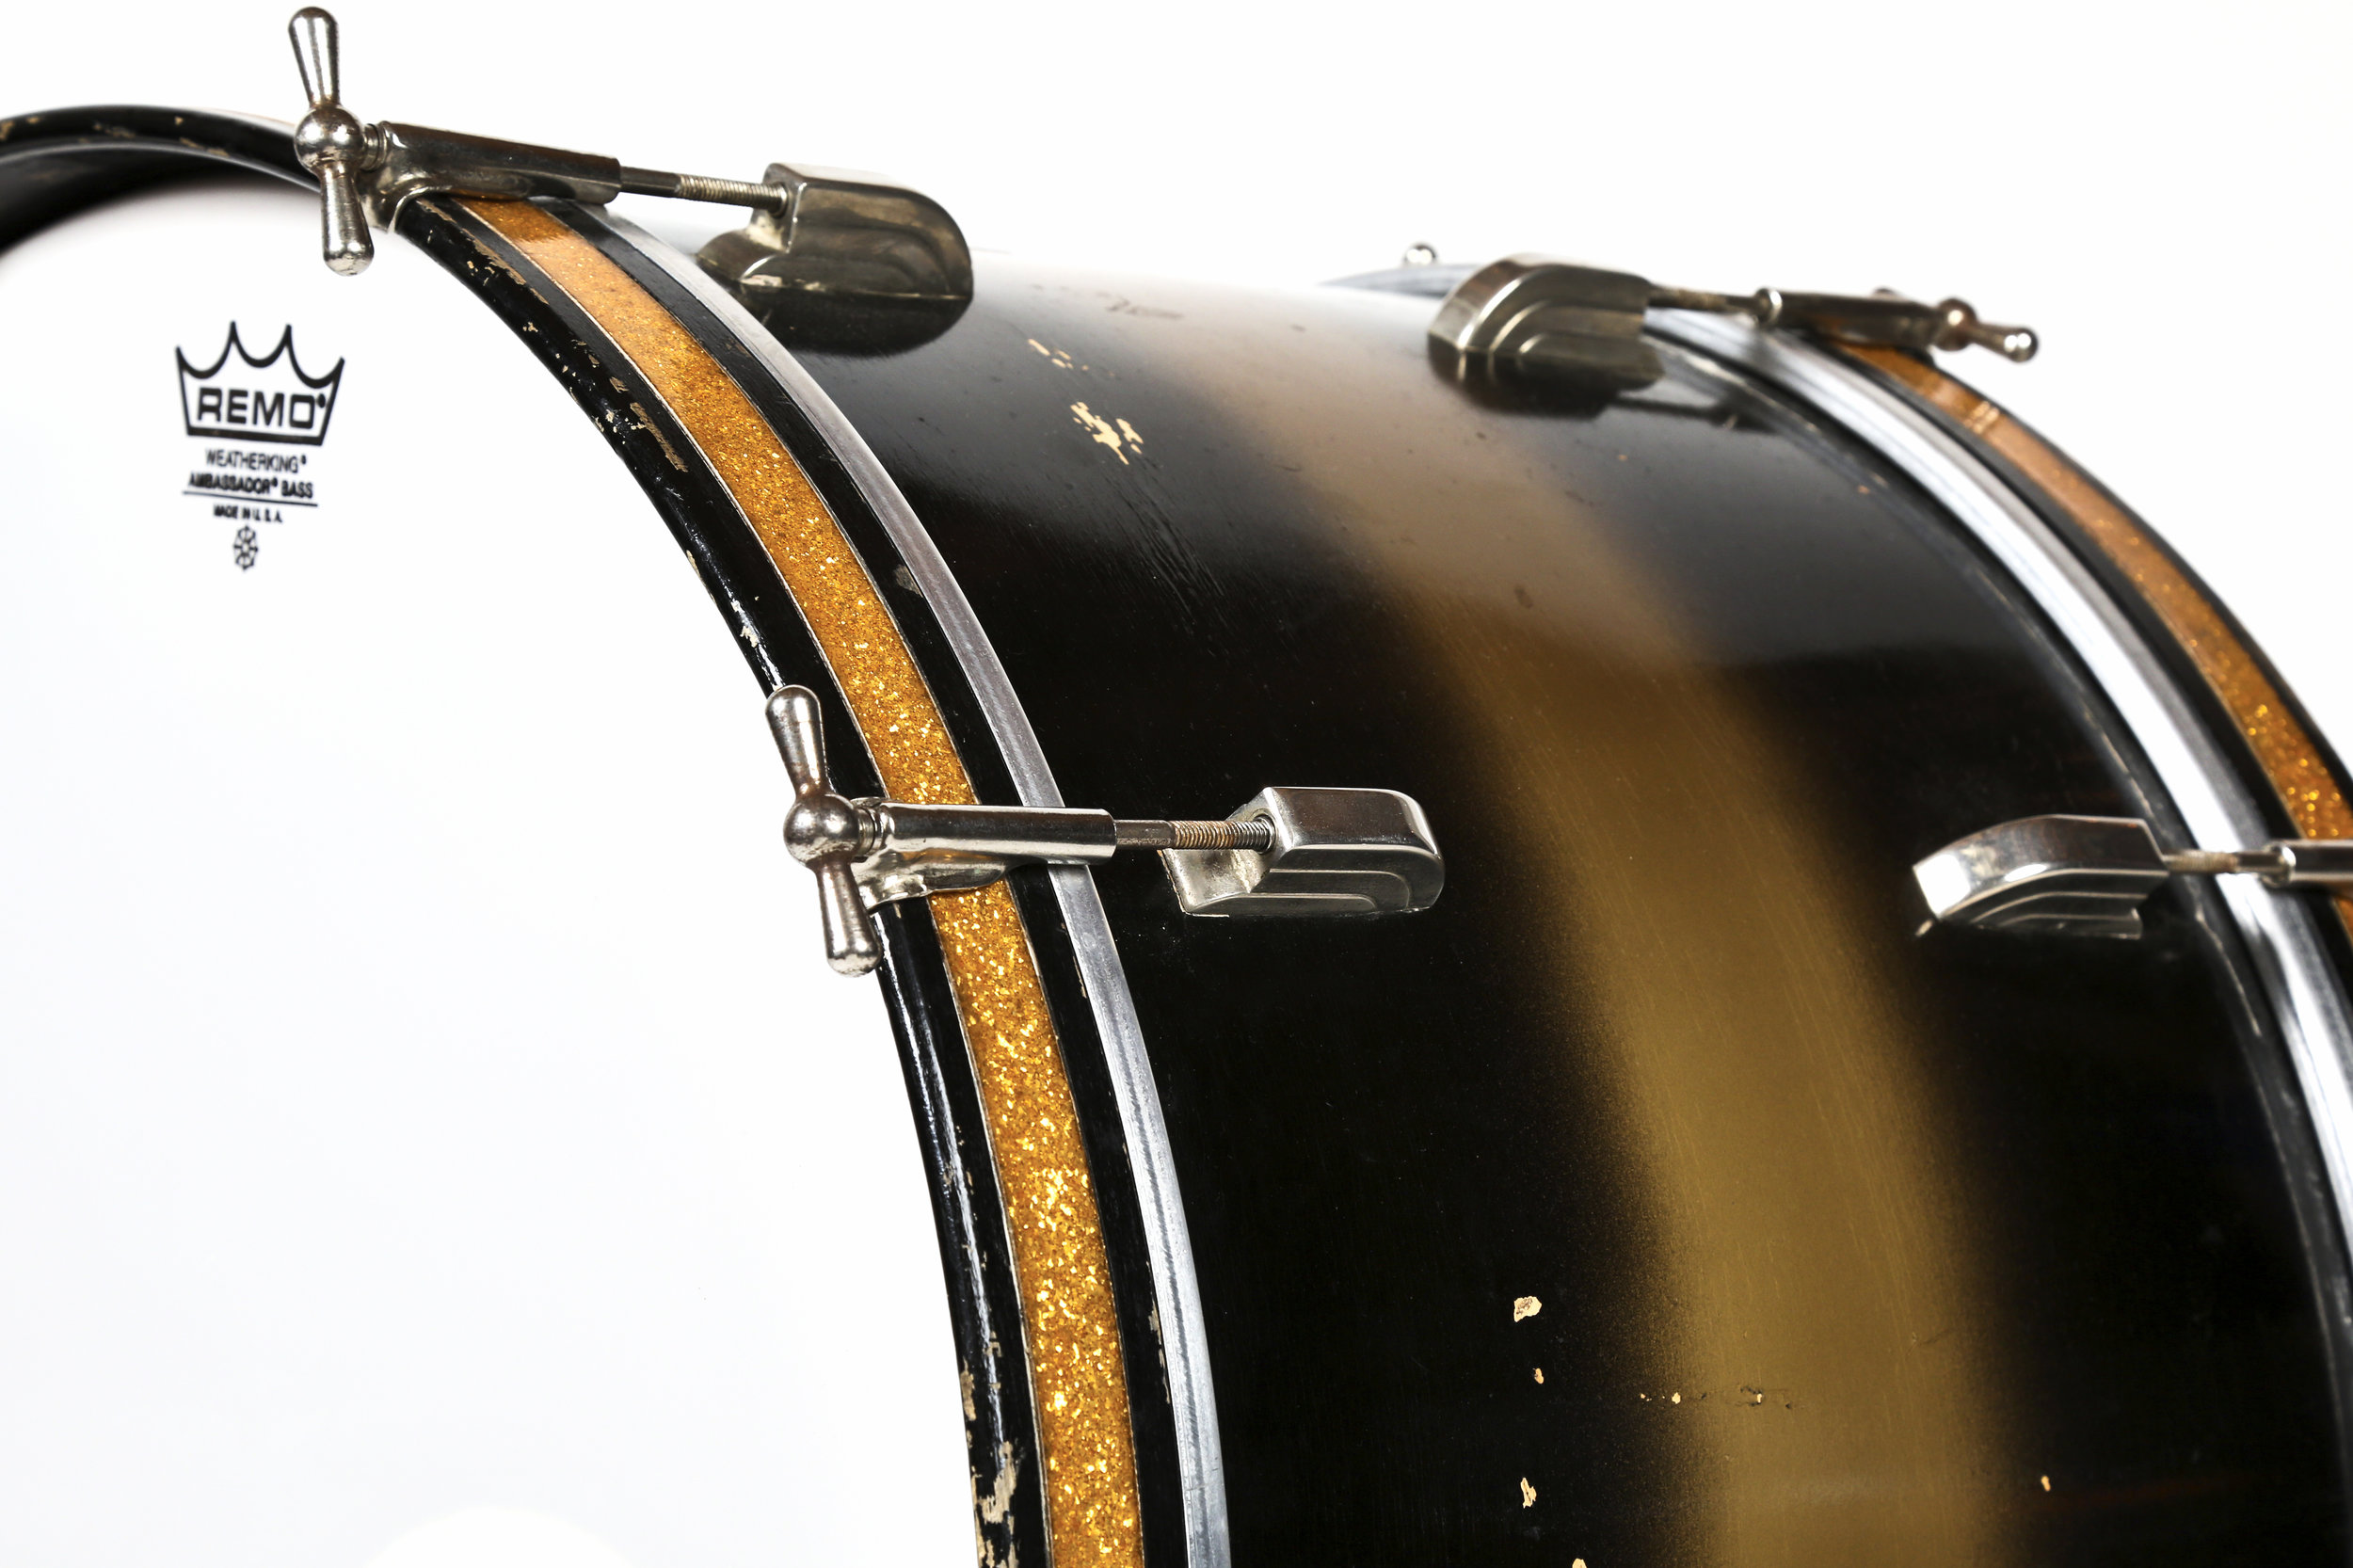 Dorio Vintage Drum_C&C Big Red_1960.jpg